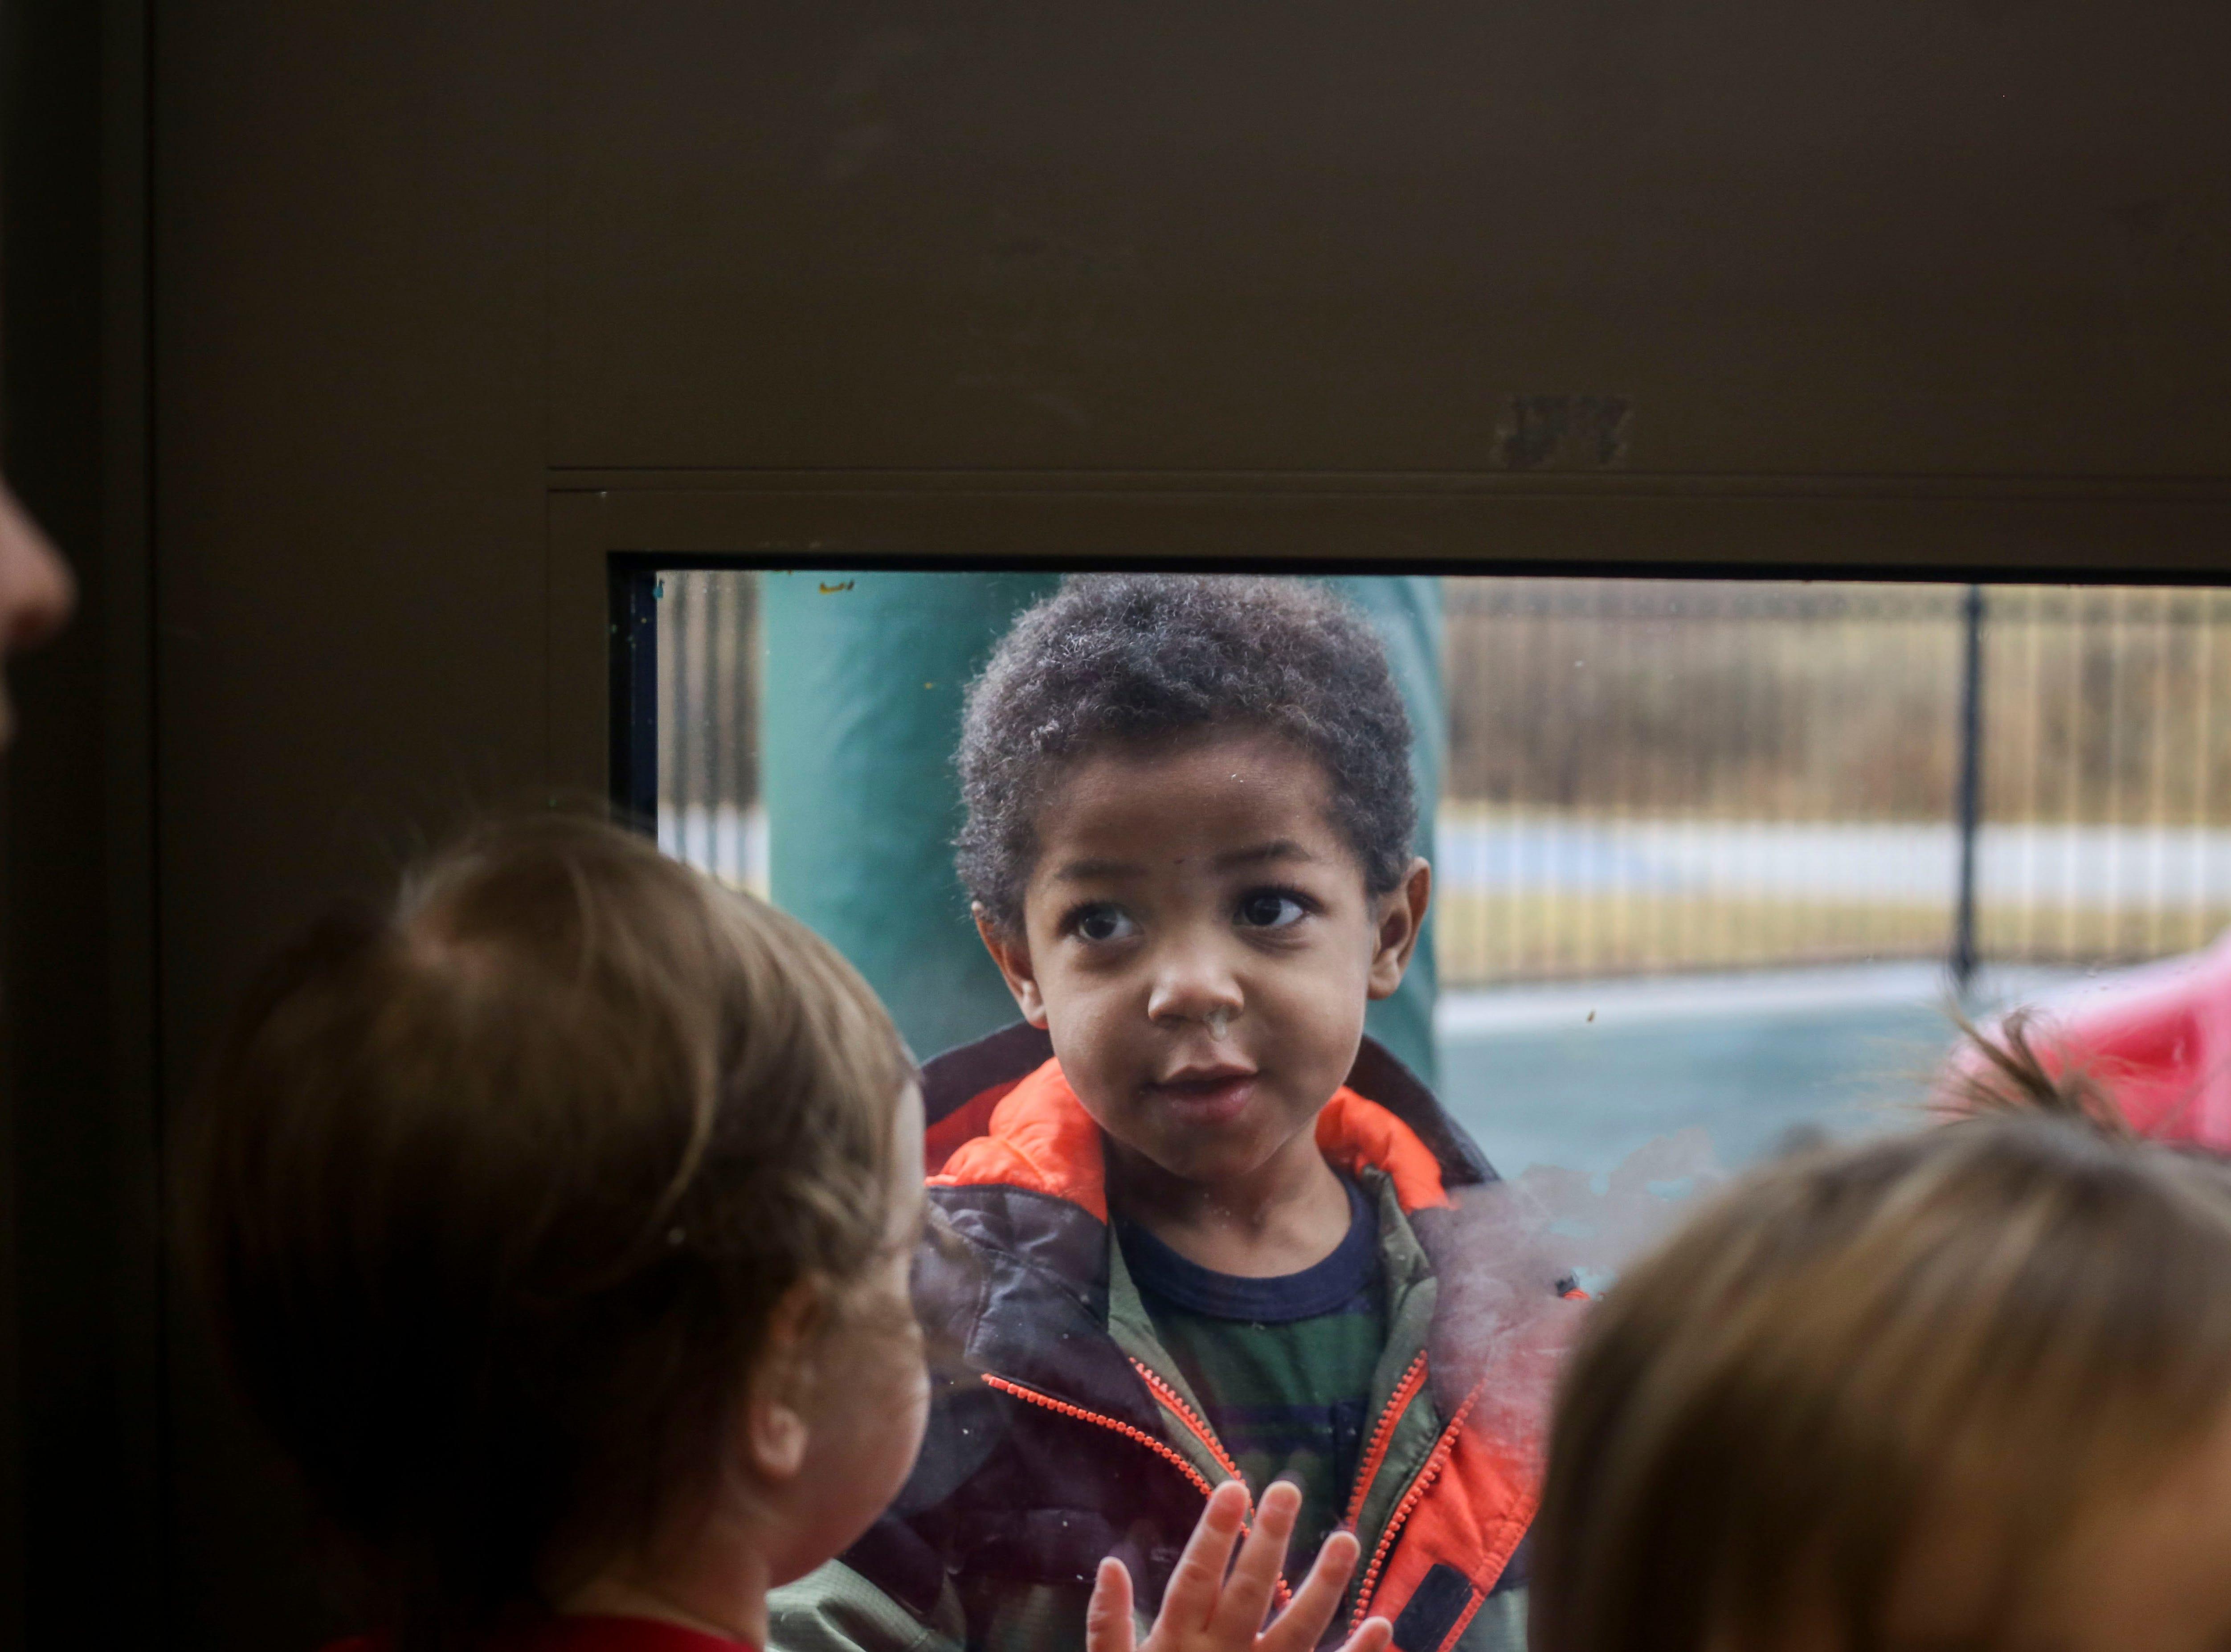 Jayden Nesbitt looks through the glass door into another class during the Early Head Start program at Brooks Elementary School in Brooks, Ky. on Feb. 5, 2019.